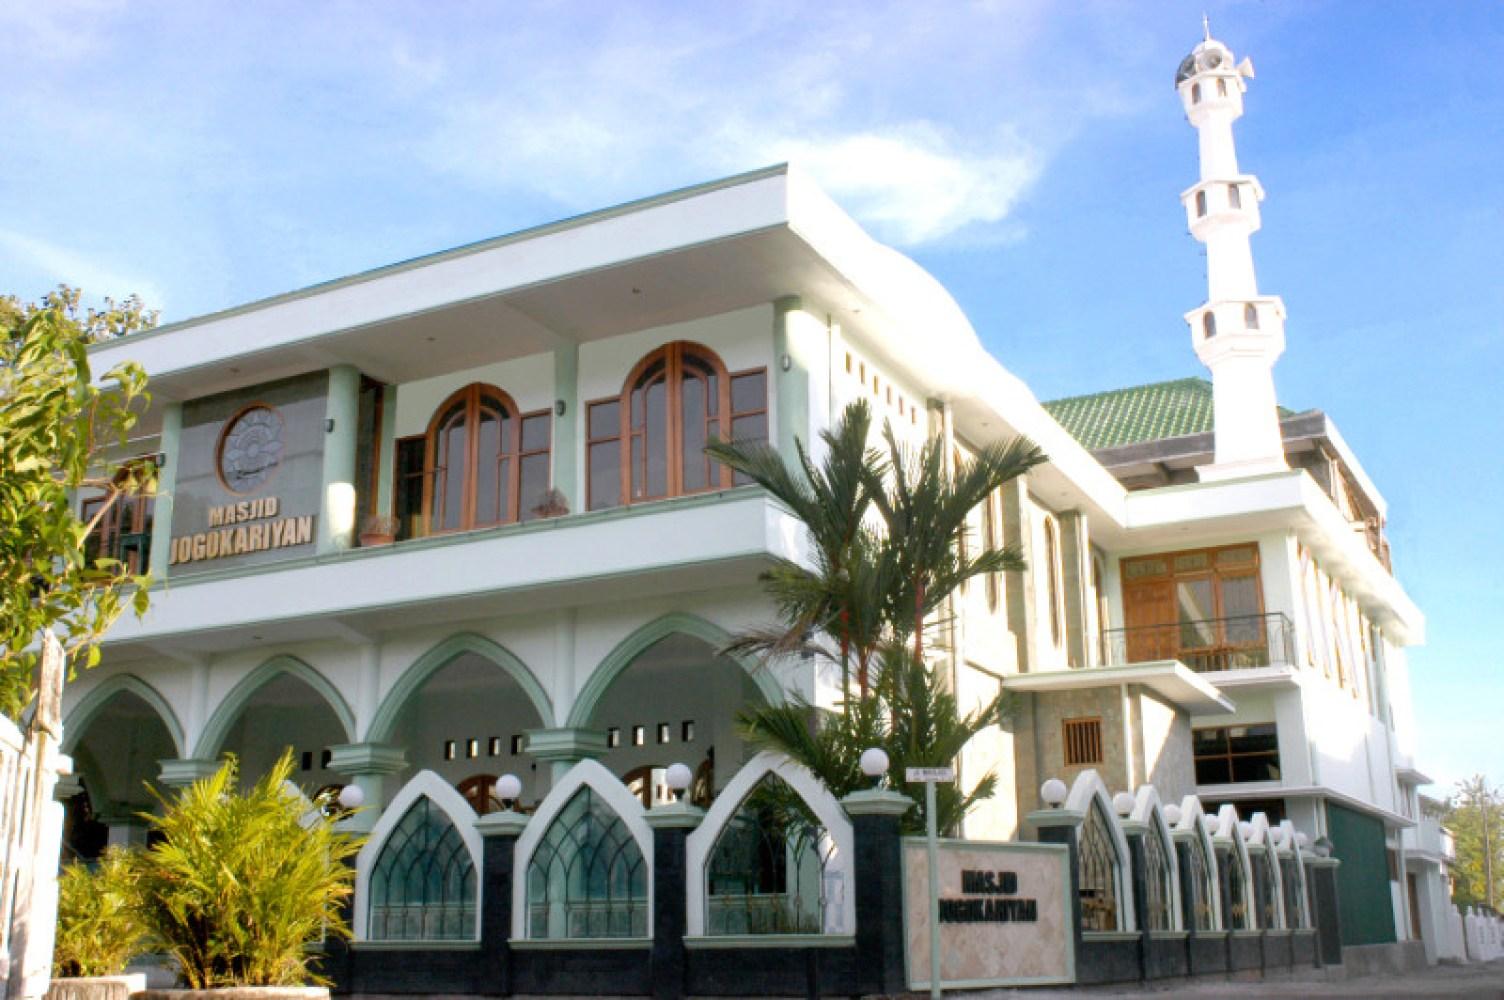 Sumber www.masjidjogokaryan.com